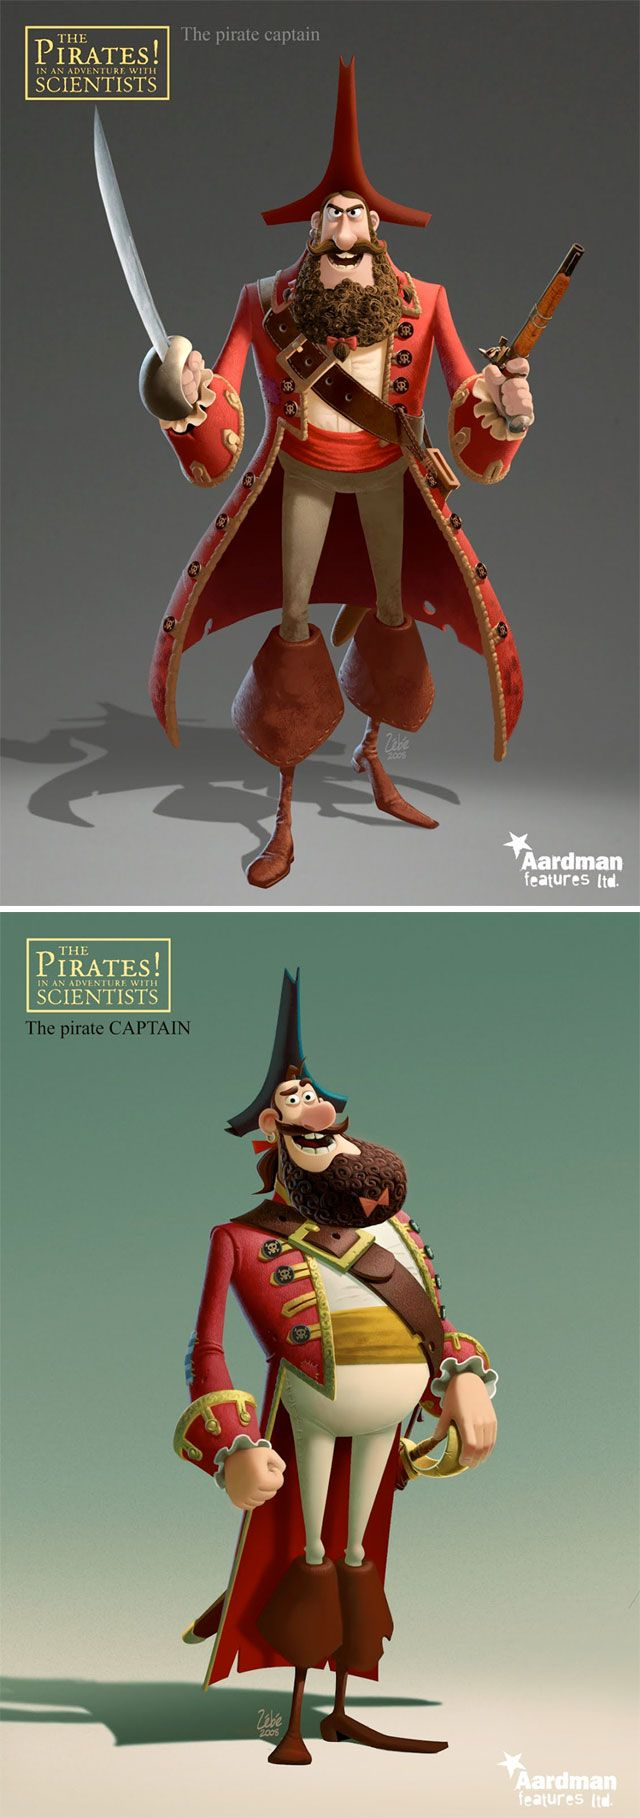 http://theconceptartblog.com/wp-content/uploads/2012/05/Pirates-conceptart-Zebe-2.jpg